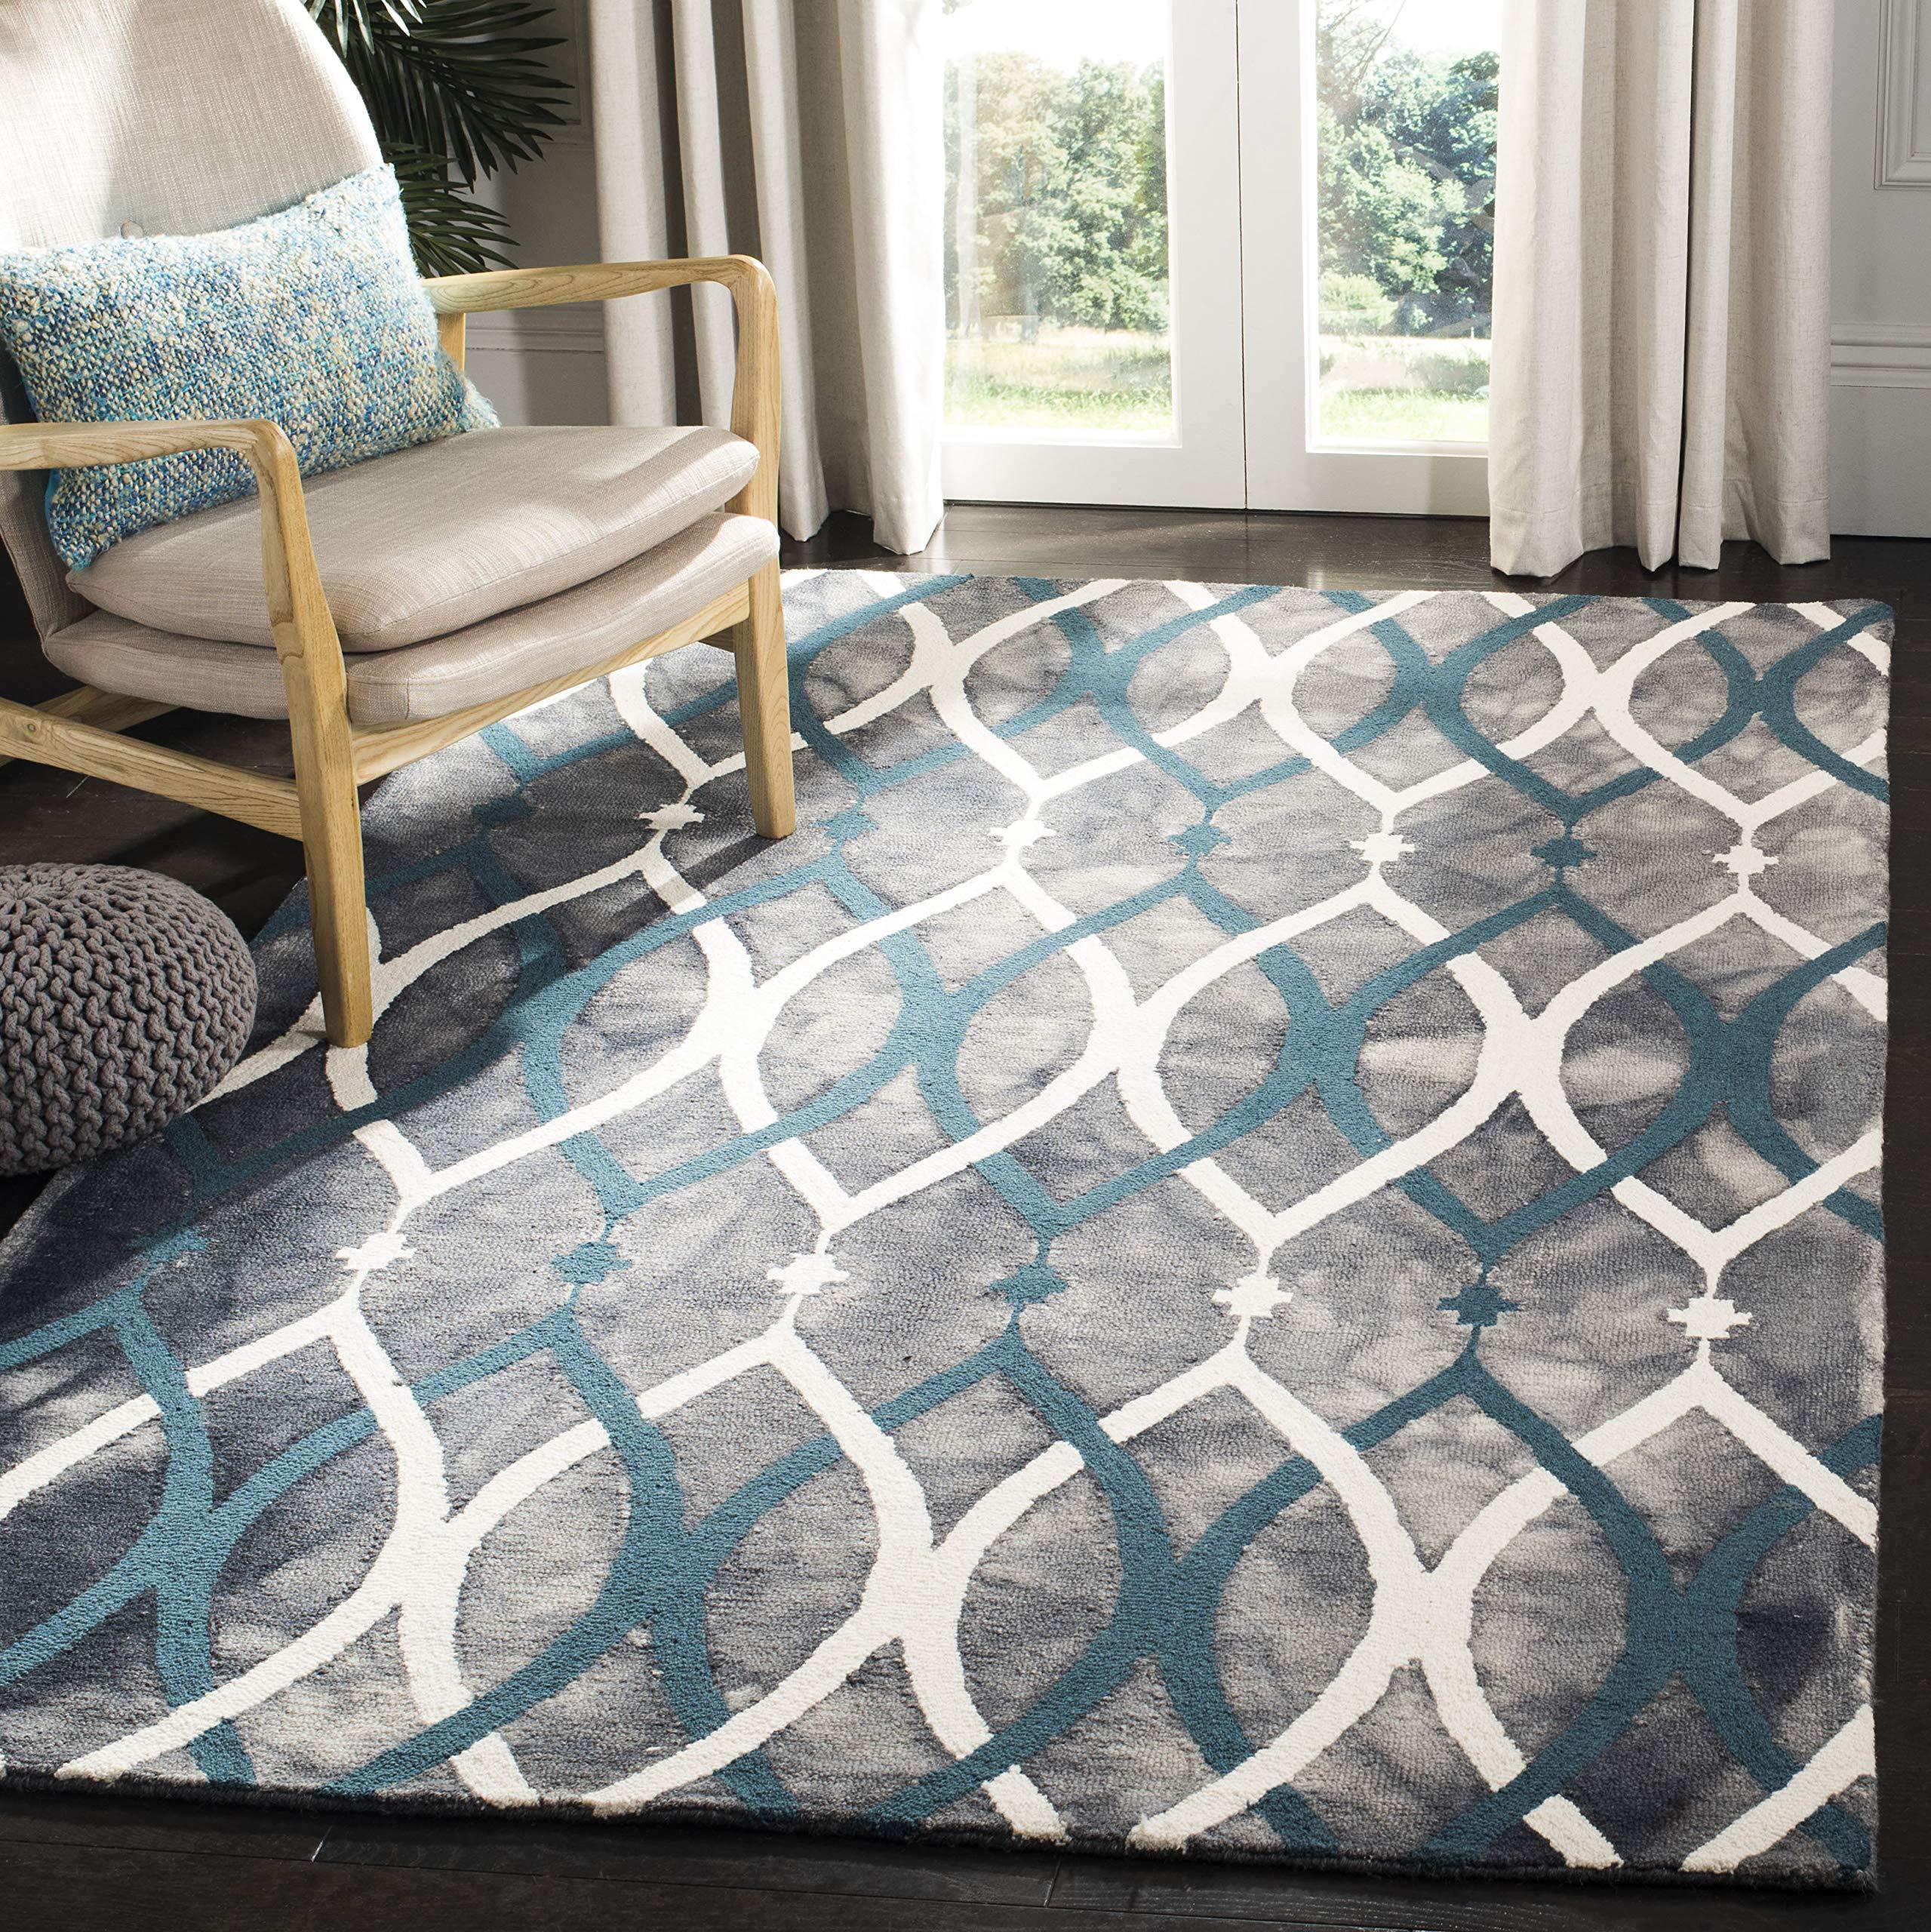 Safavieh Dip Dye Collection Ddy534j Handmade Modern Geometric Watercolor Grey And Ivory Blue Wool Area Rug 8 X 10